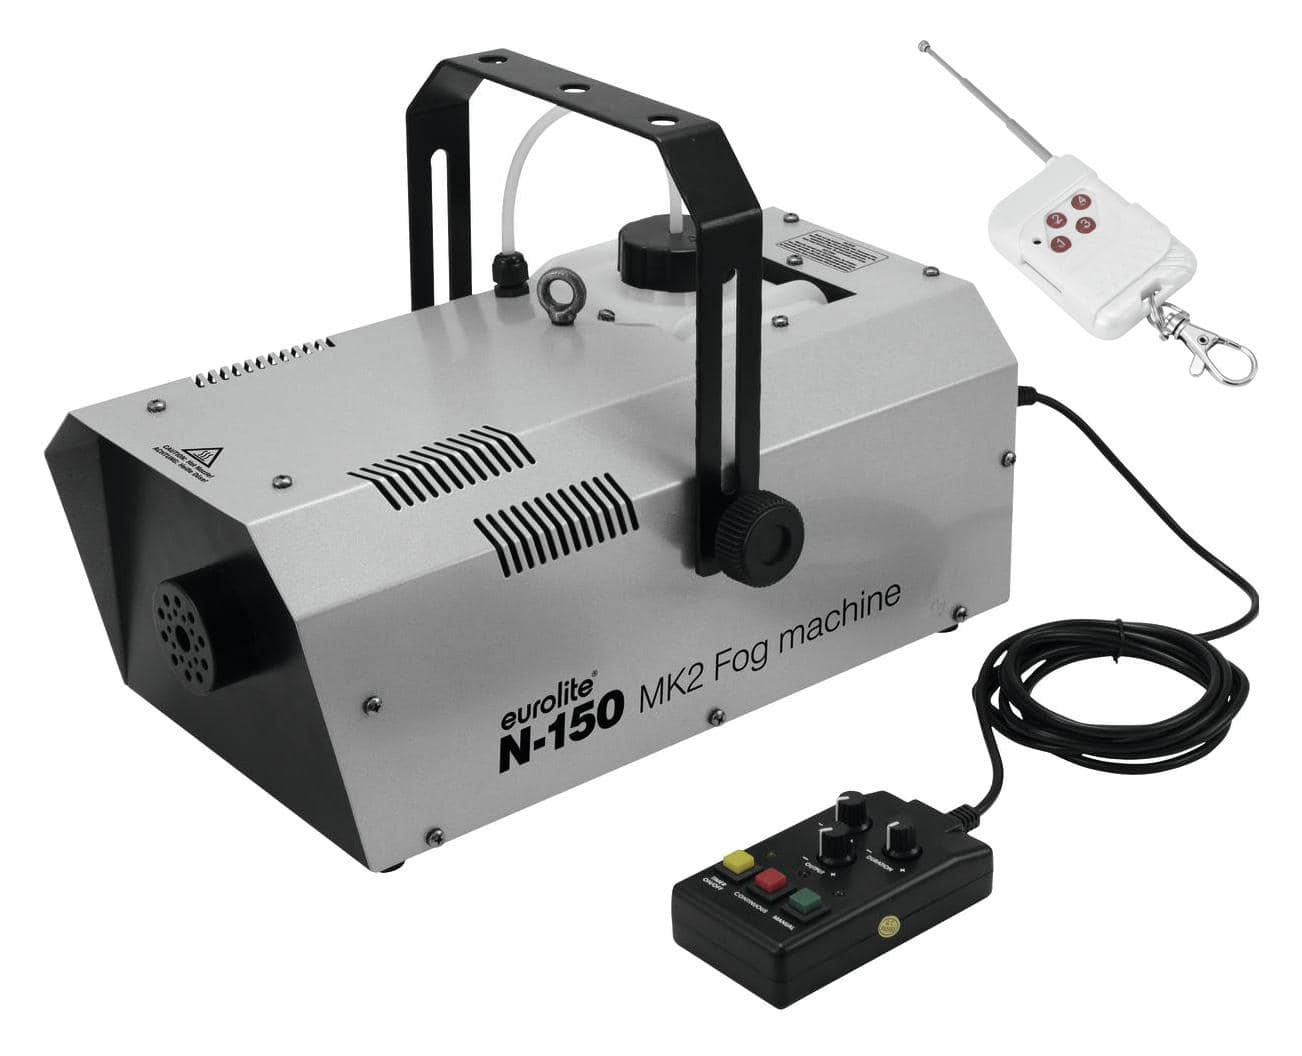 Eurolite N 150 MK2 Nebelmaschine